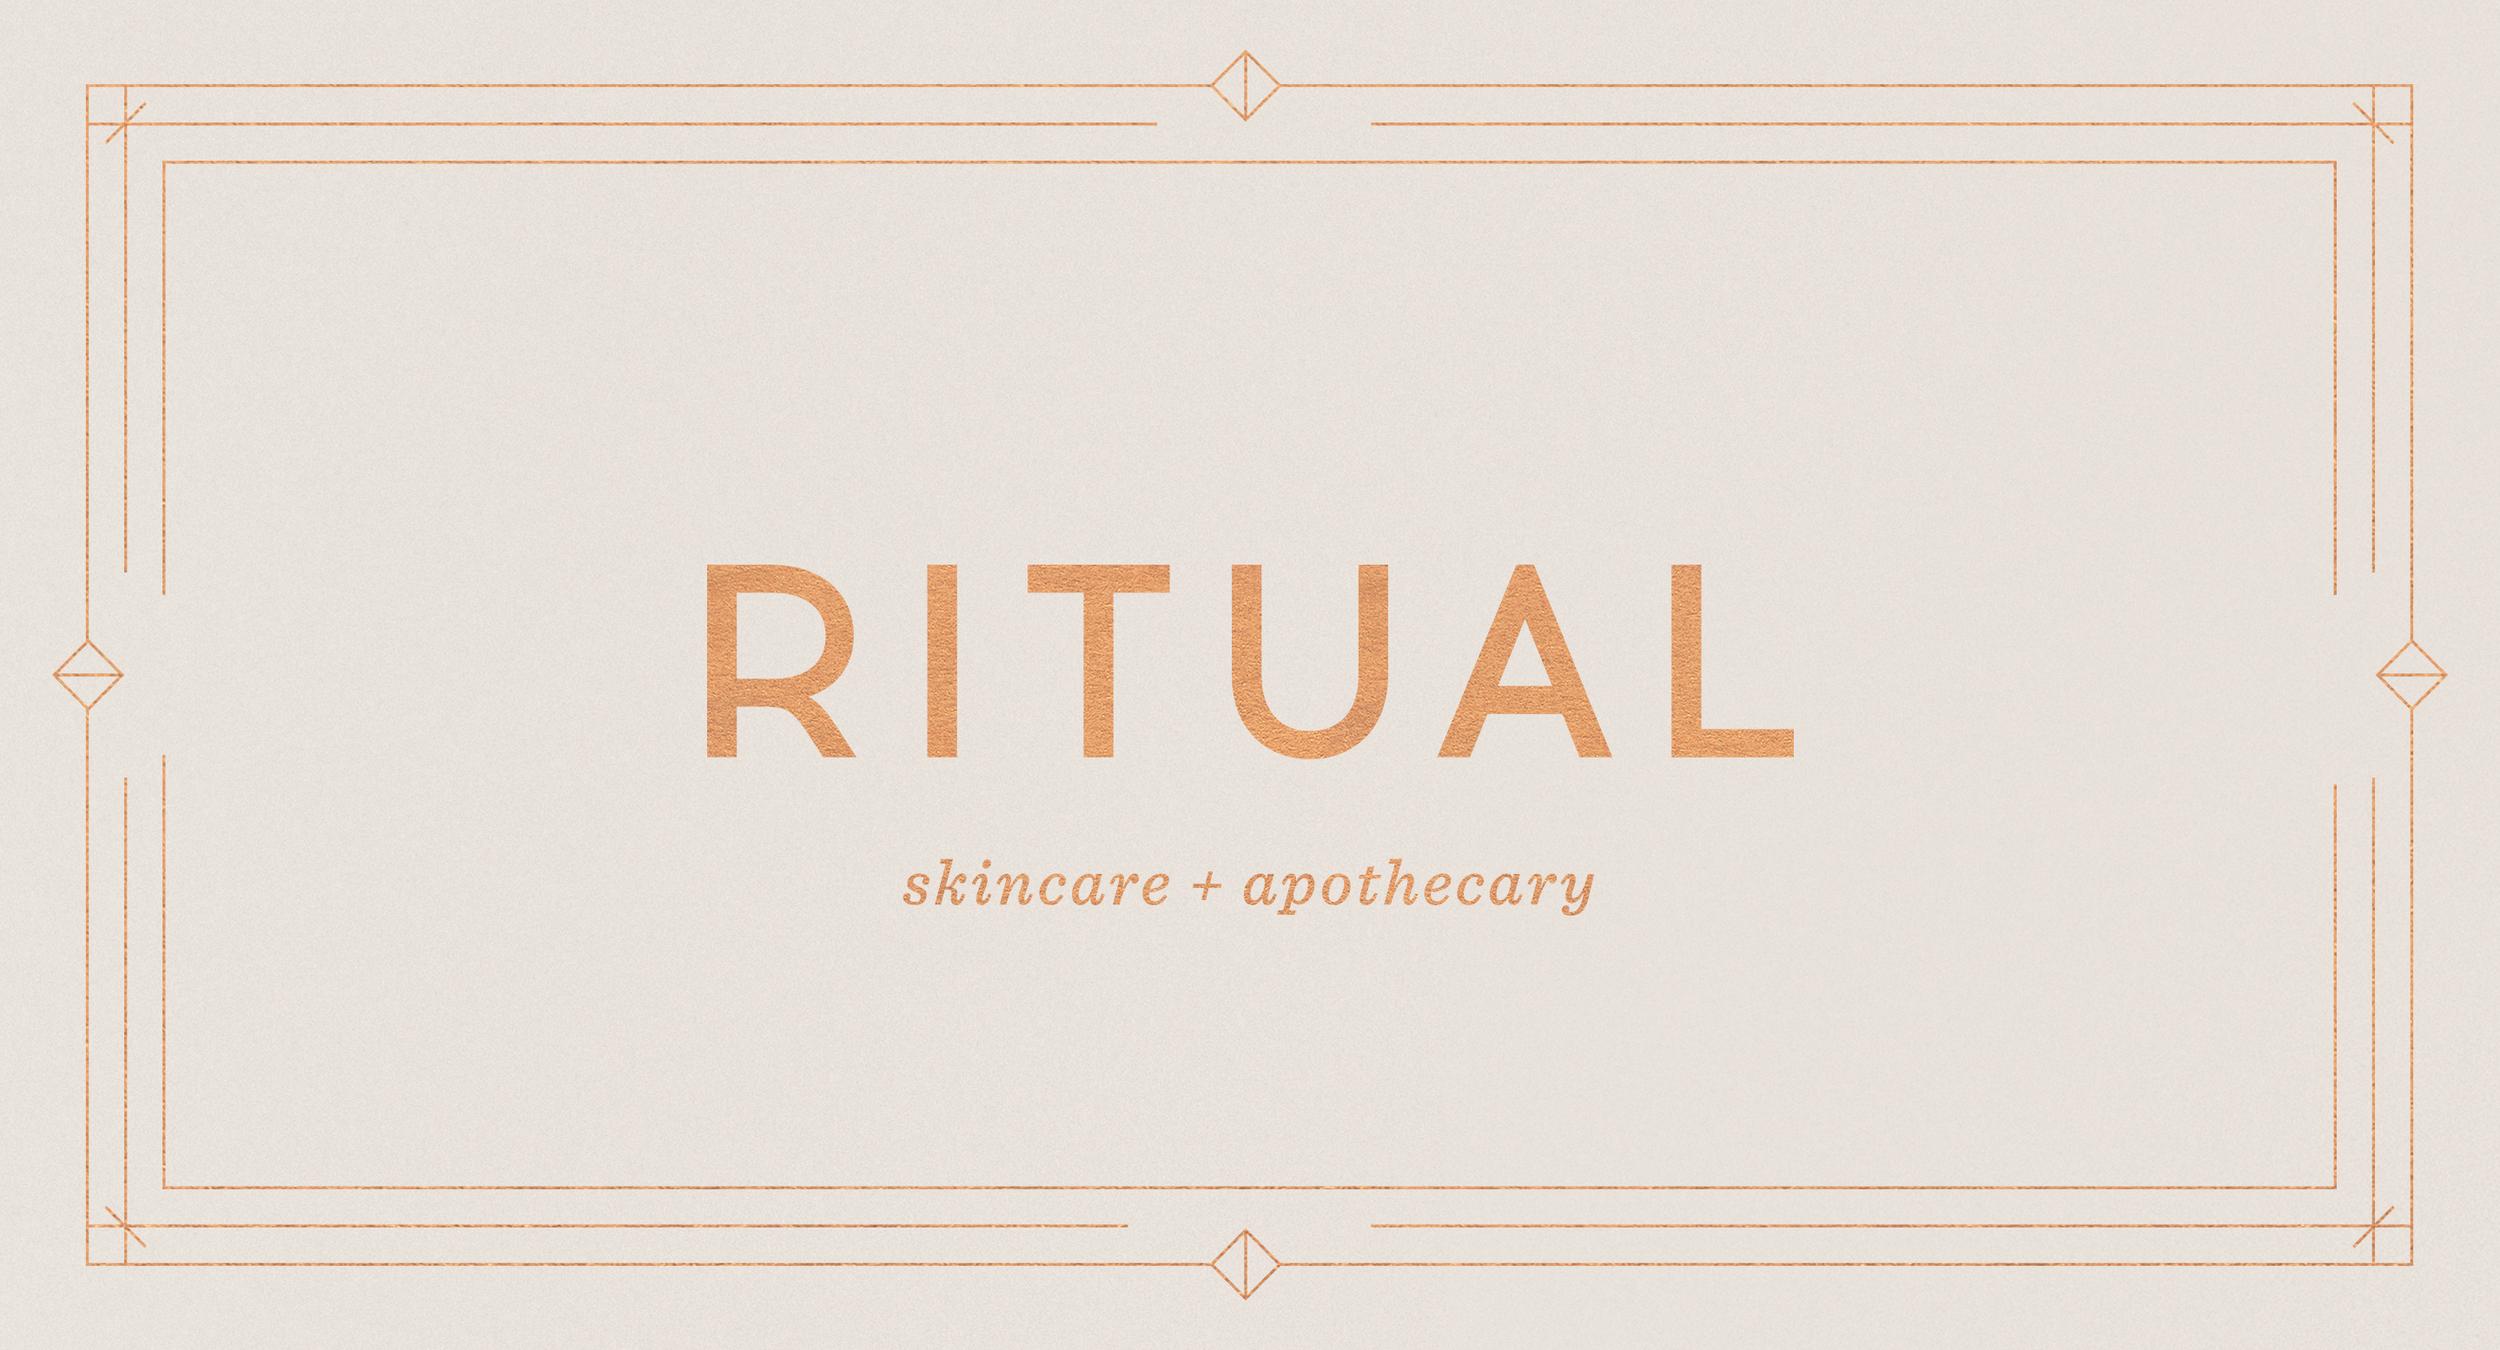 ritual_logotype_texture.png